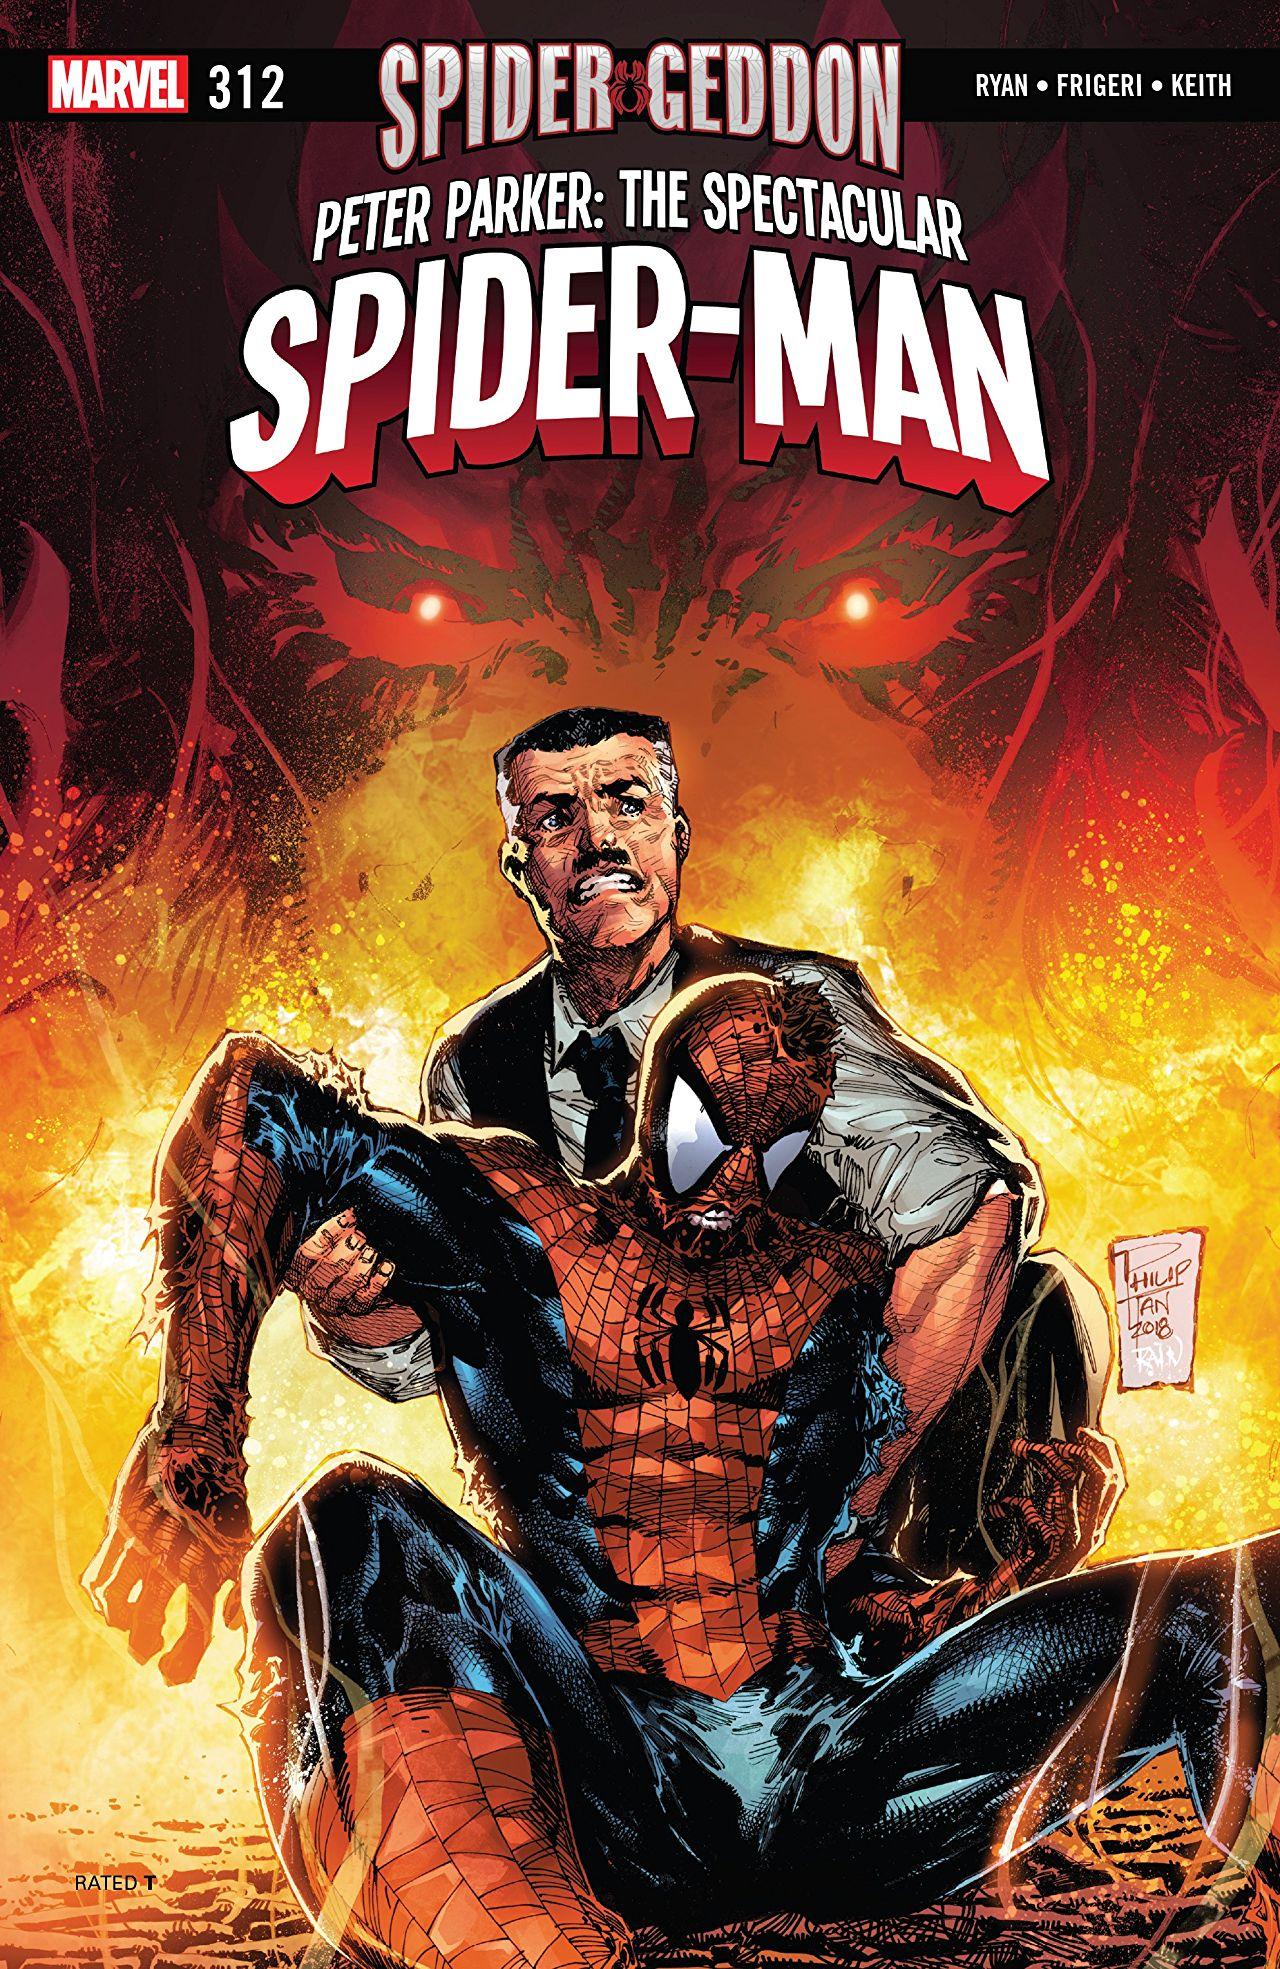 Peter Parker - The Spectacular Spider-Man 312